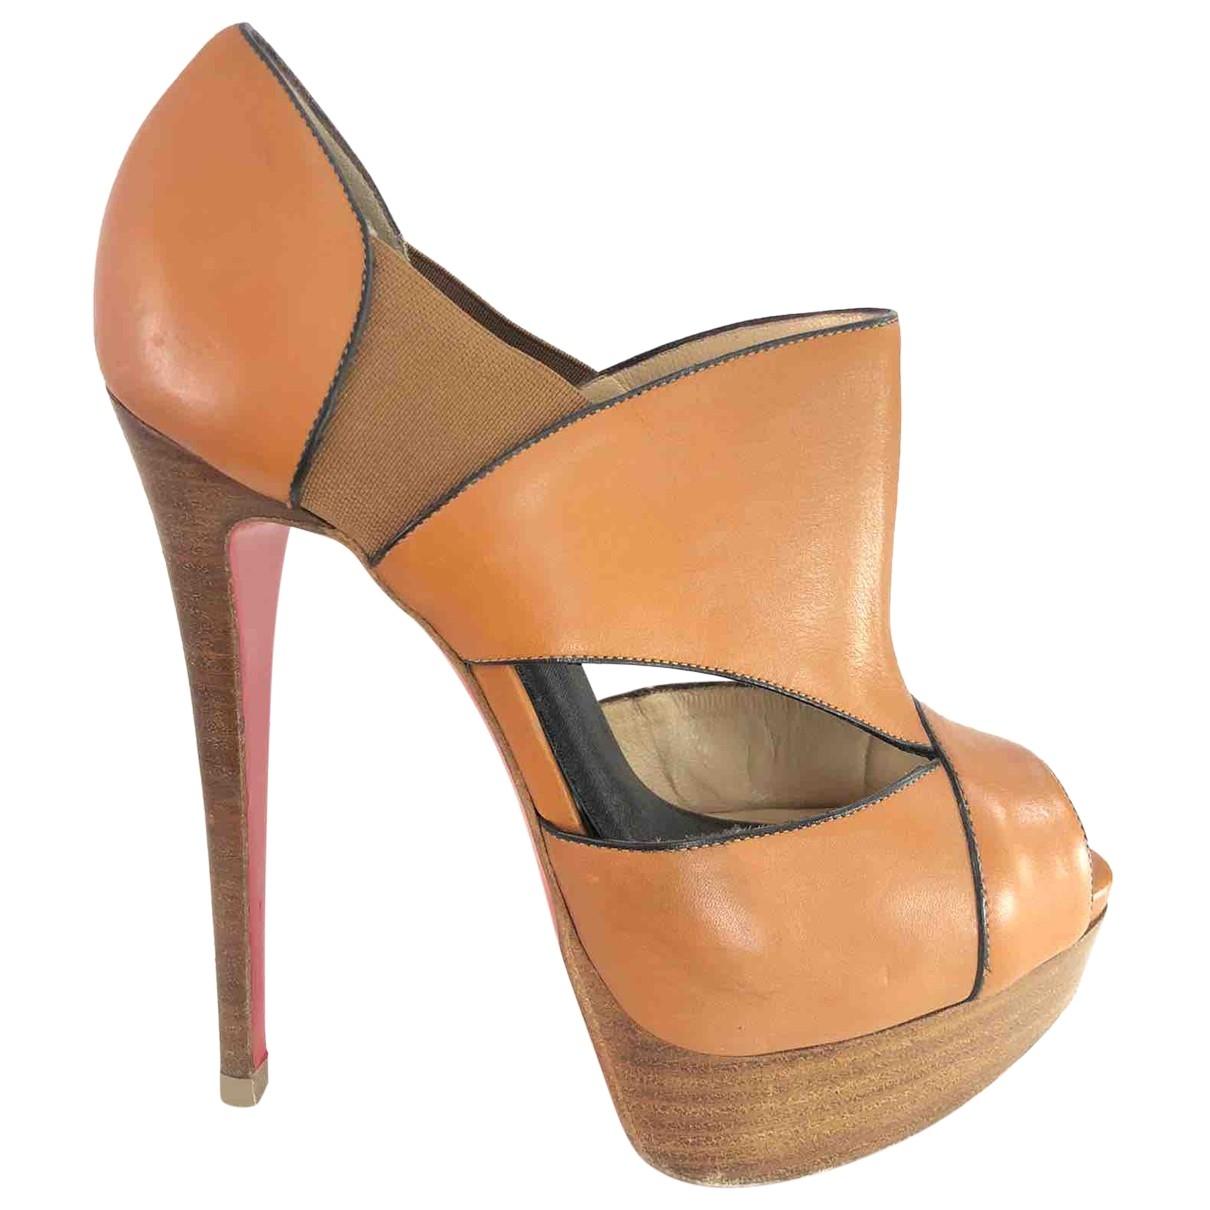 Christian Louboutin \N Camel Leather Sandals for Women 37 EU